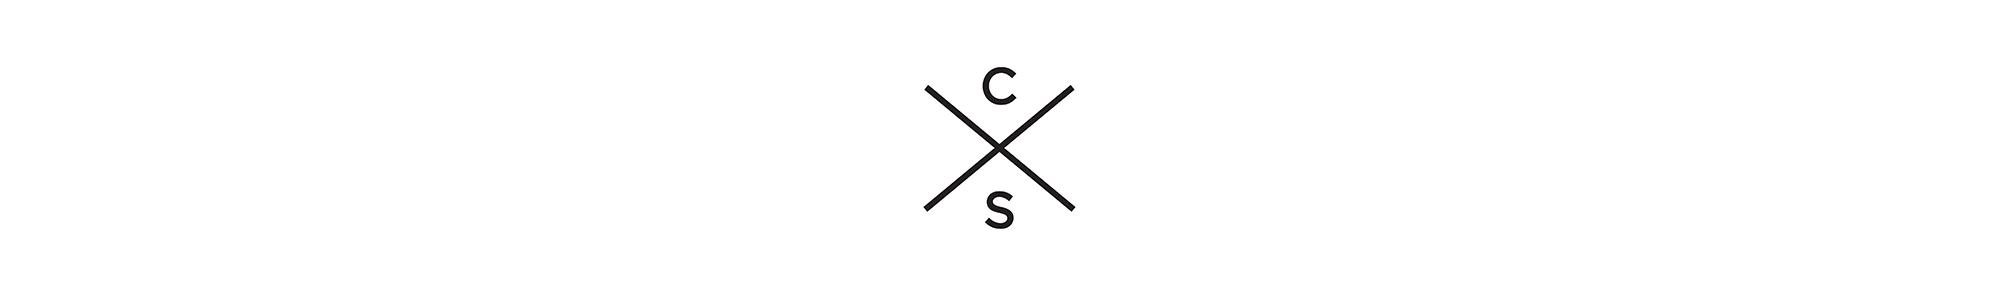 CXS_CERCLE_BLANC_GR_HD.png